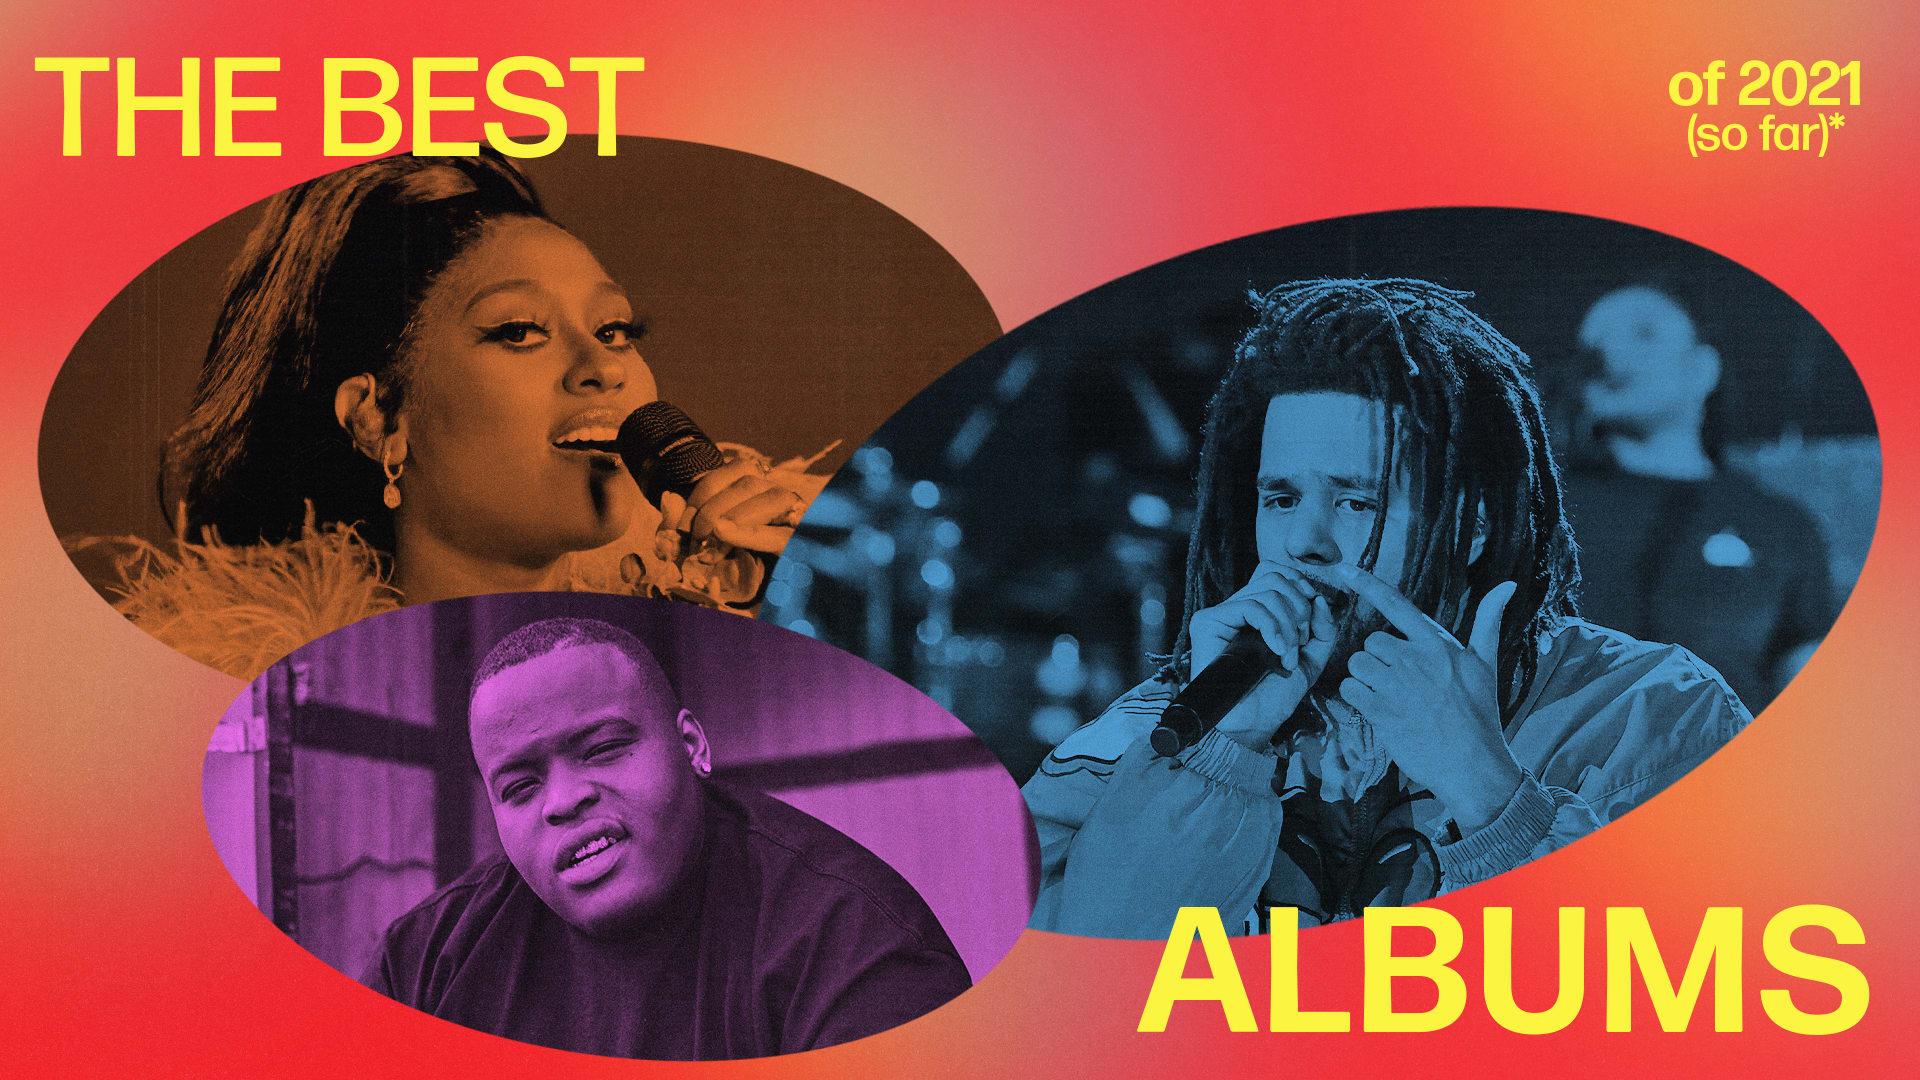 Best Albums of 2021 (So Far)